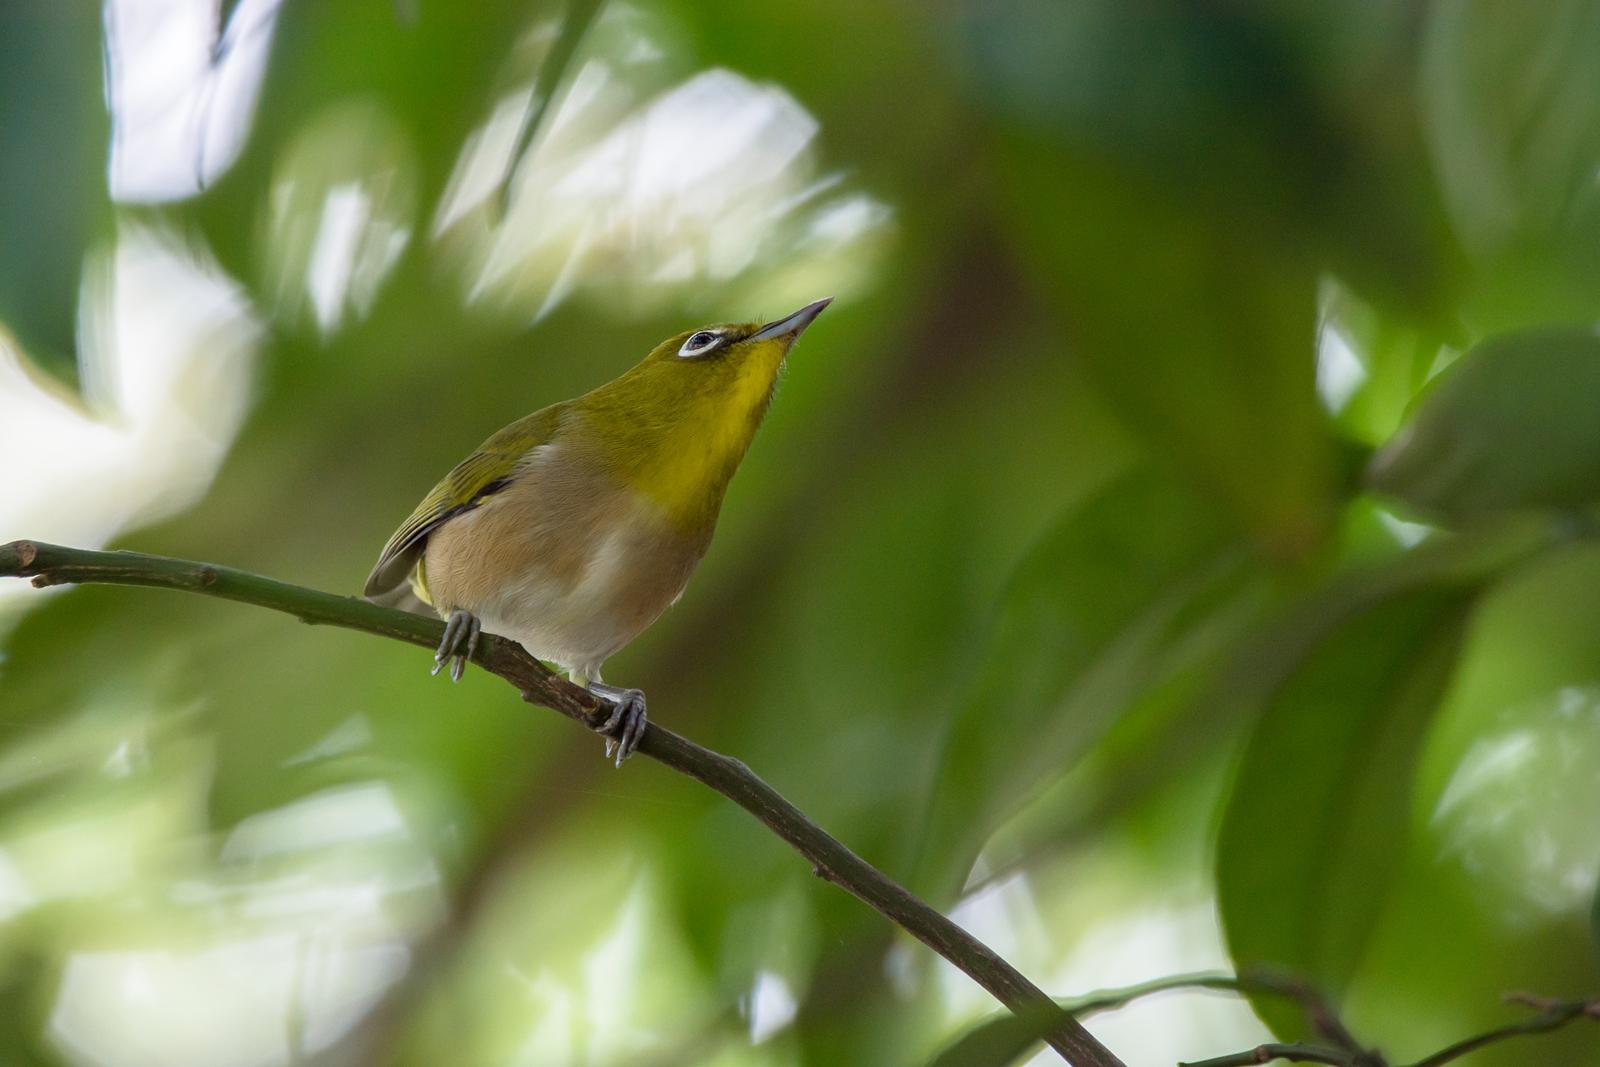 Photo: 落ち着く空間 Peace of mind.  深く茂る木々 心地良く溶け込める 安心できる場所 緑が優しく包んでくれる  Japanese White-eye. (メジロ)  #birdphotography #birds #cooljapan #kawaii #nikon #sigma  Nikon D7200 SIGMA 150-600mm F5-6.3 DG OS HSM Contemporary